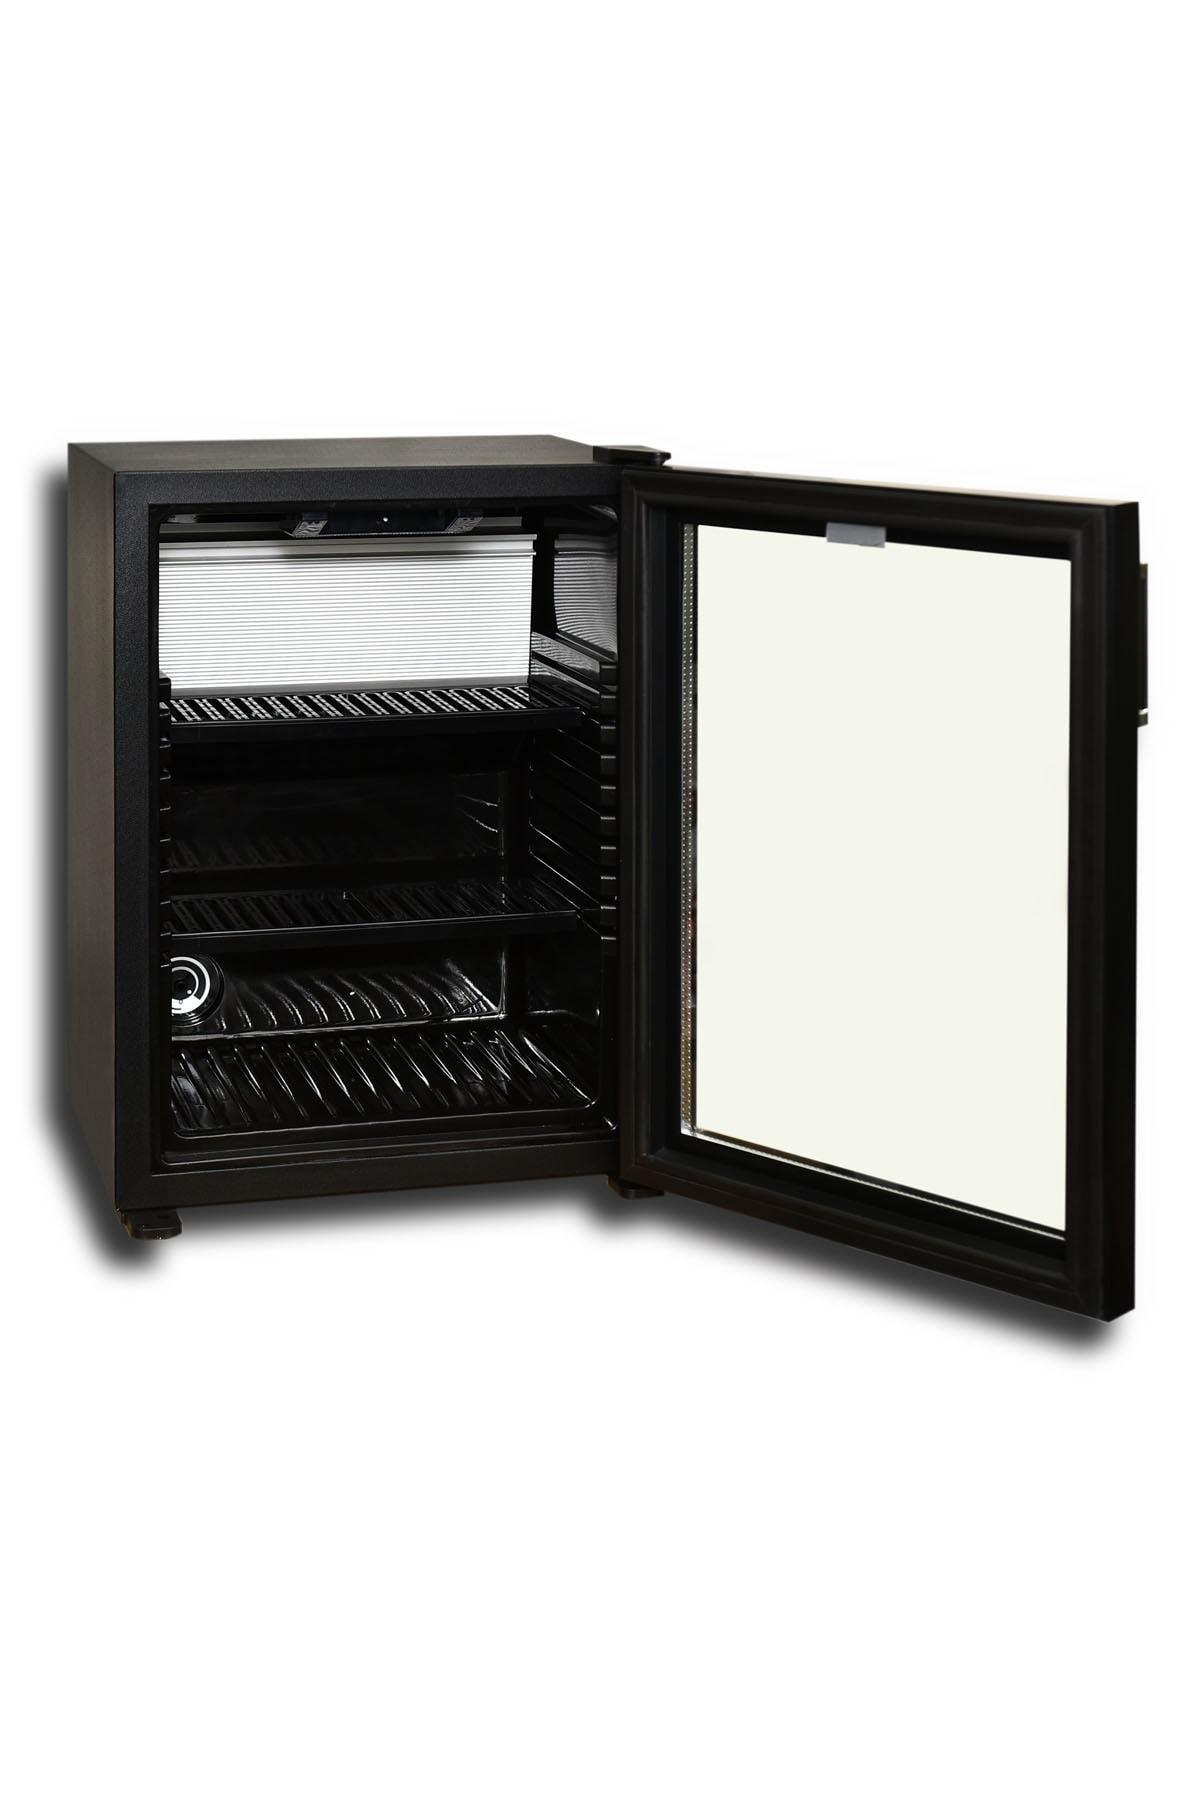 Elektromarla 35 Litre Cam Kapılı Minibar - Black Edition 2